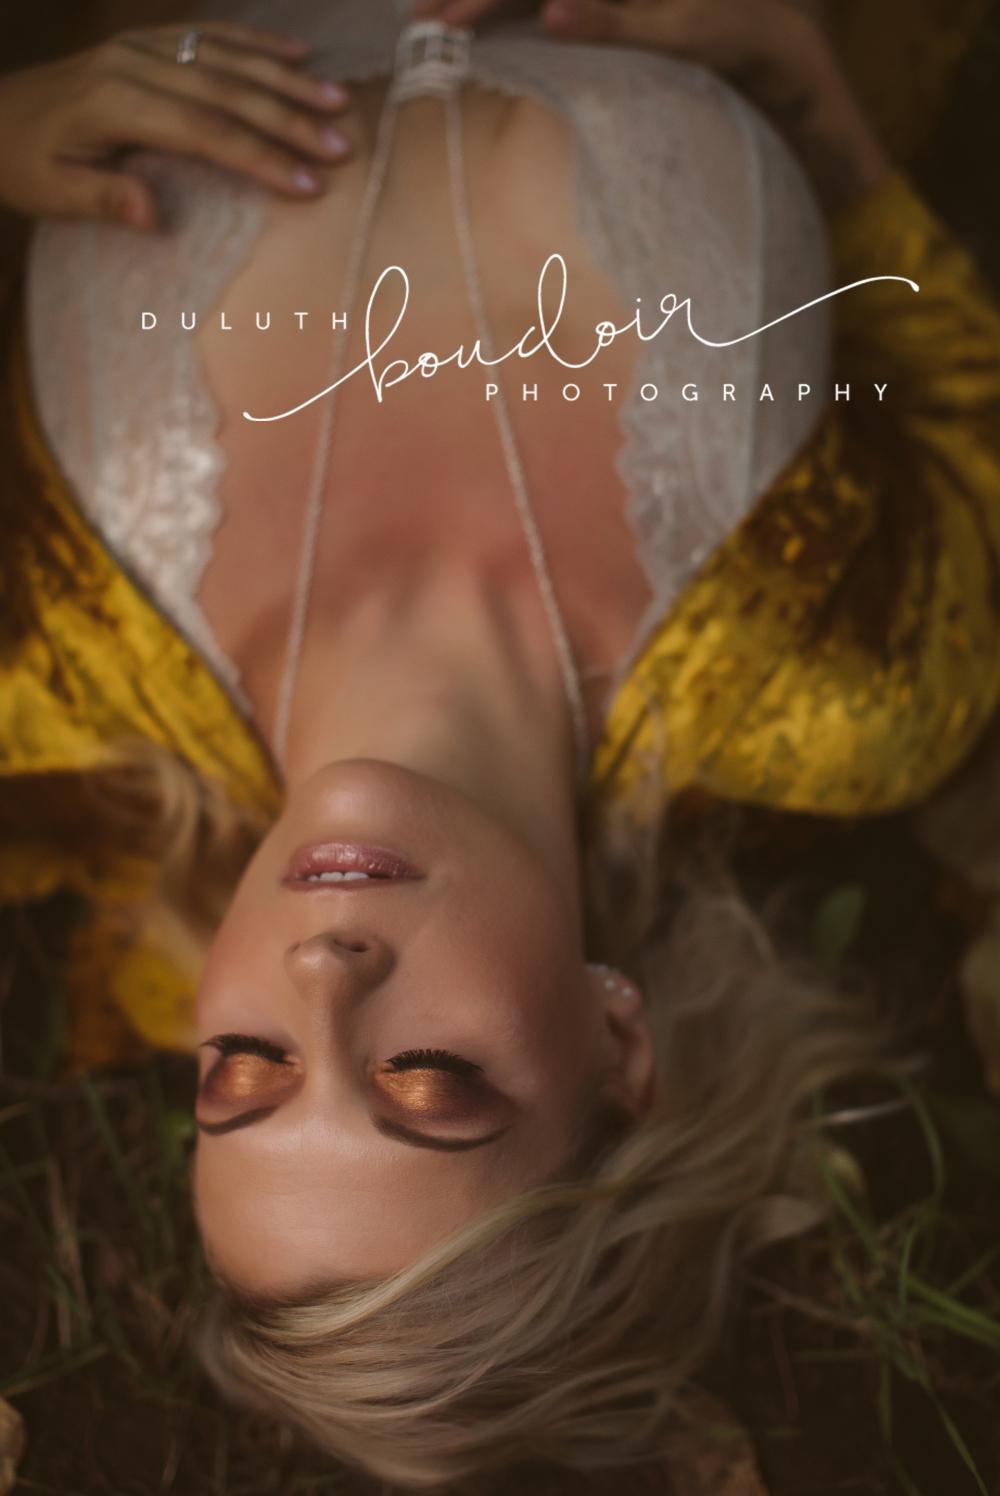 duluth-boudoir-photography-andrea-35